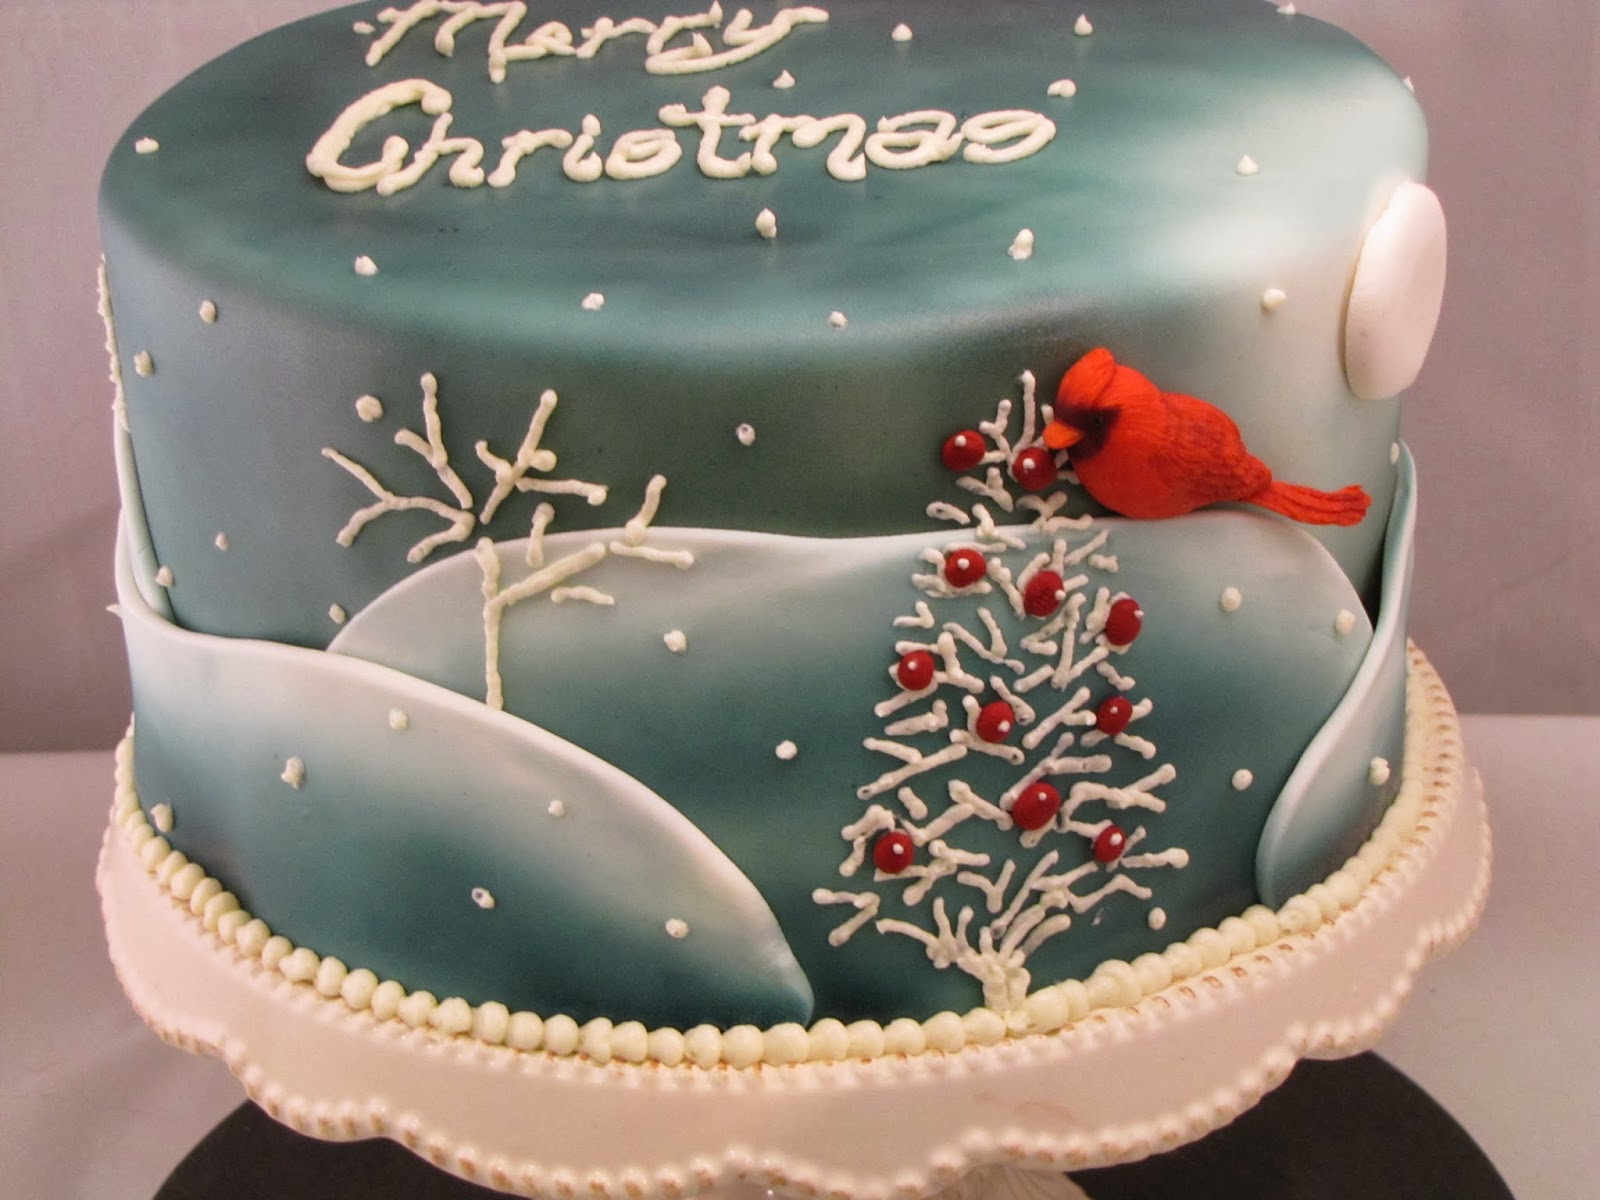 Fondant Cake Designs For Christmas : TJ Happy Cakes: Cardinal Christmas Cake